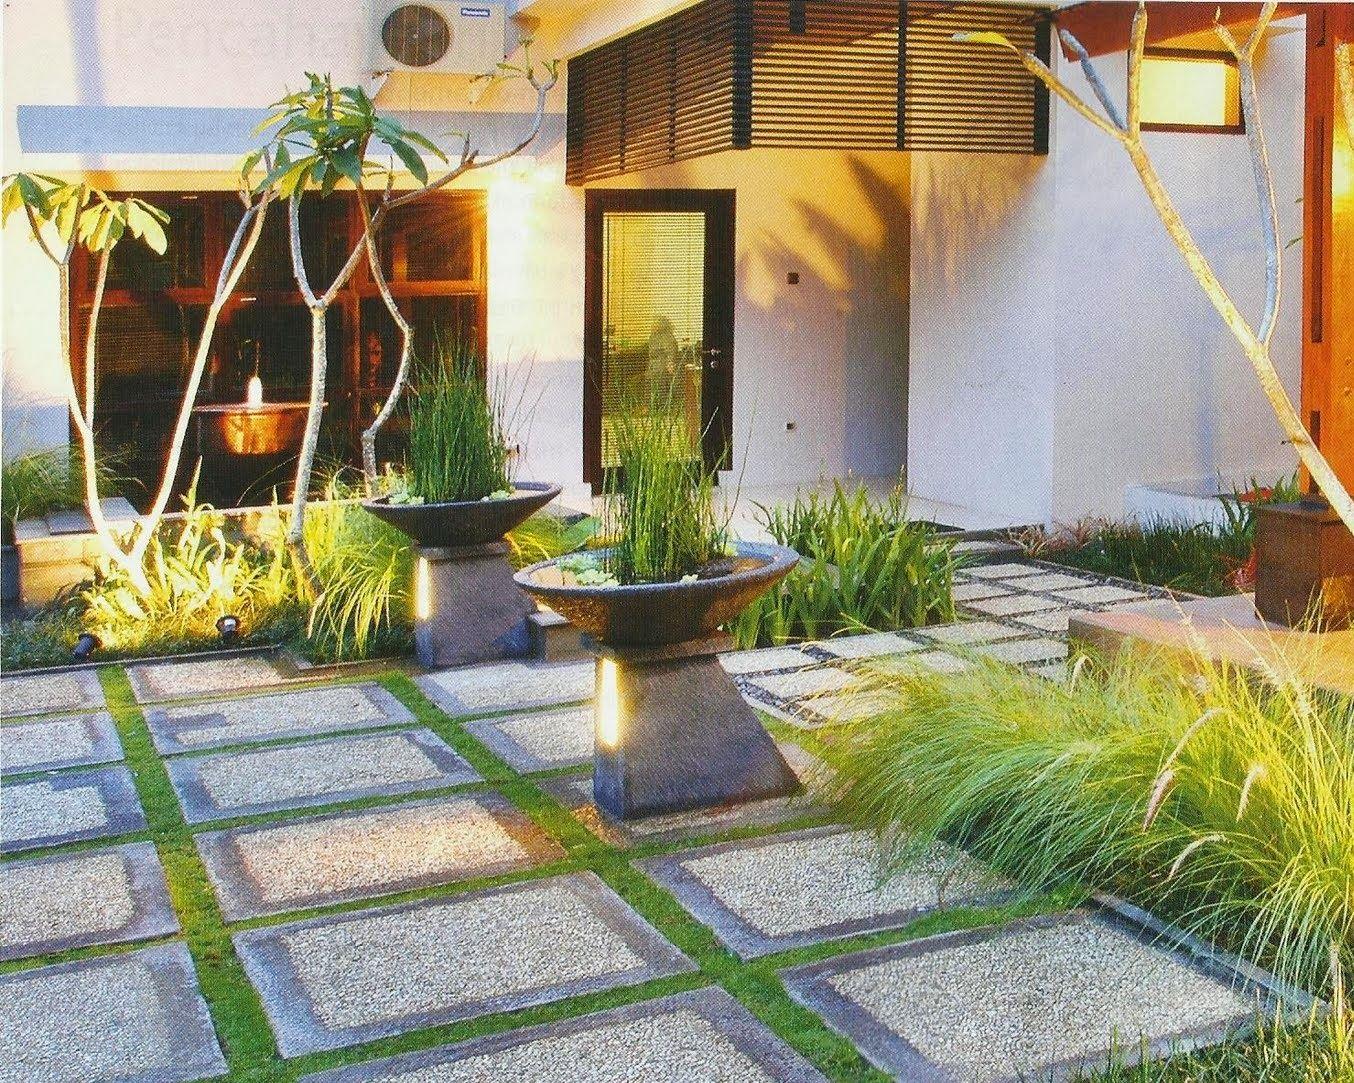 minimalist home garden design desain taman rumah on inspiring trends front yard landscaping ideas minimal budget id=89433